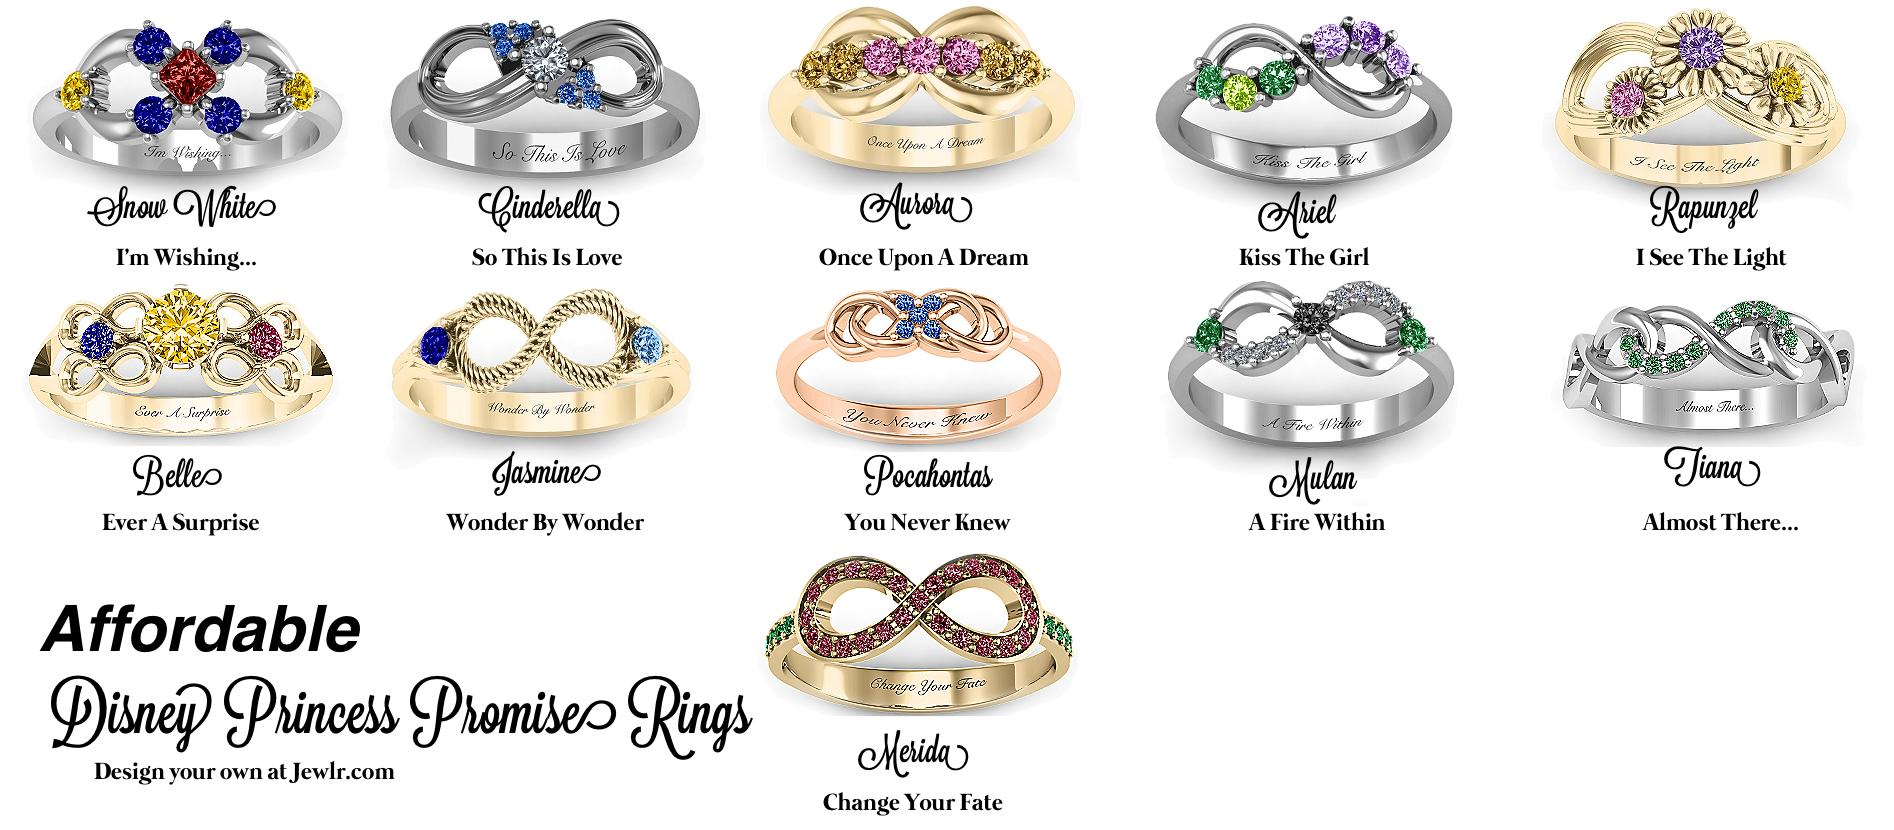 rings on disney engagement rings disney